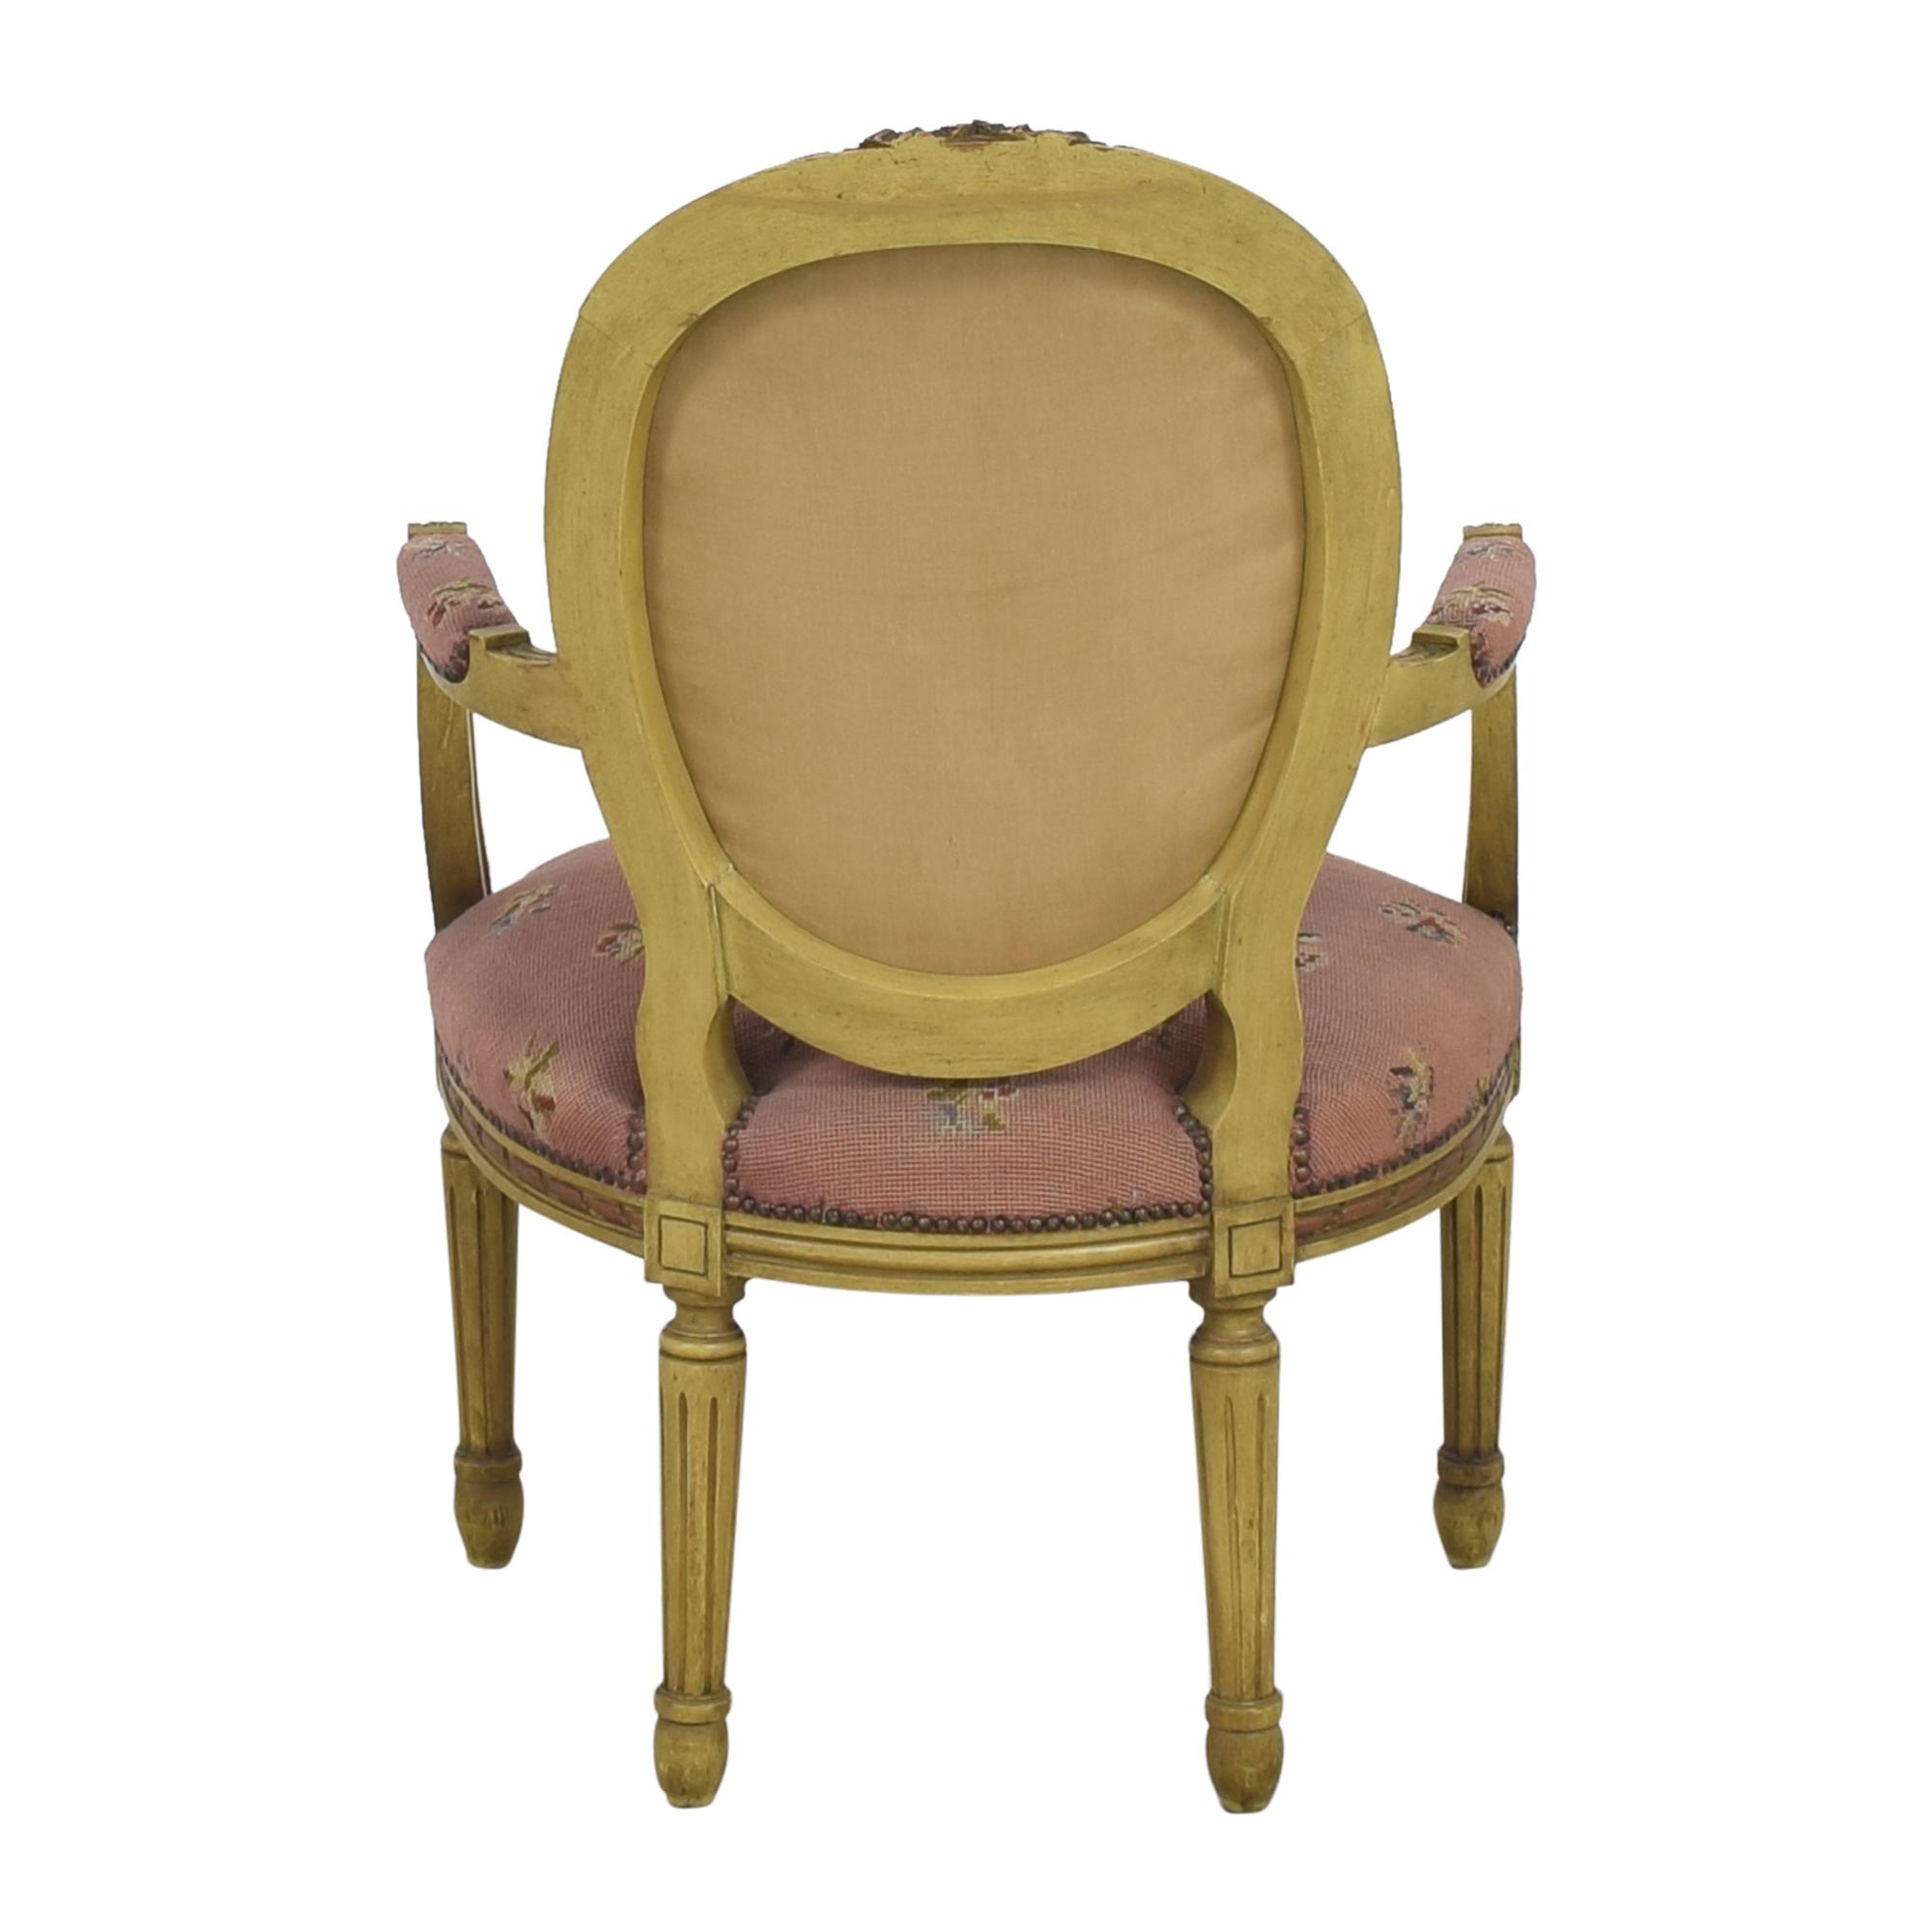 Floral Accent Chair nj